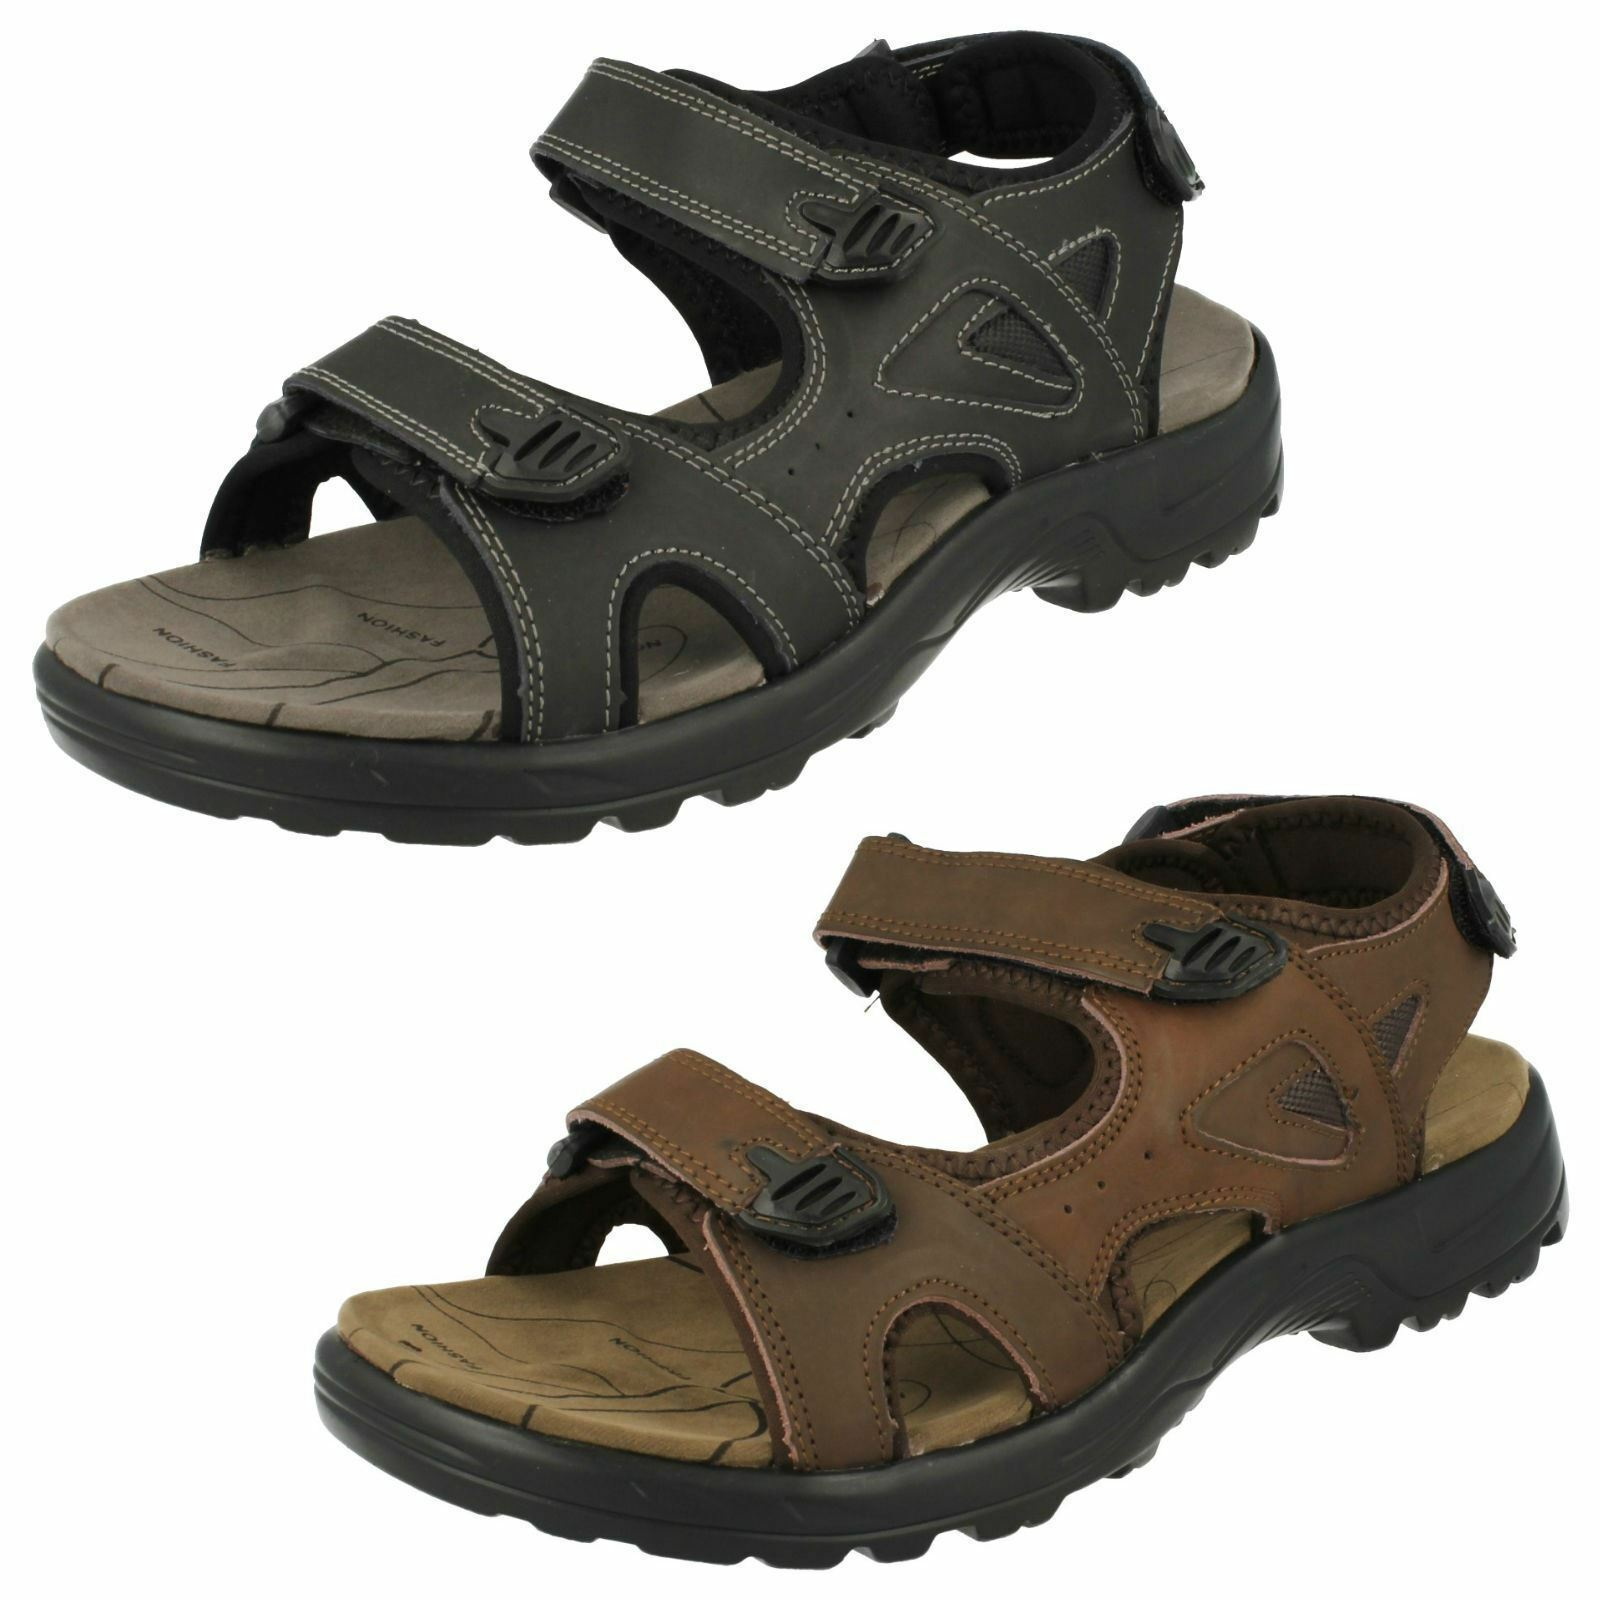 NORTHWEST TERRITORY Arabia Mens Leather Walking Sandal